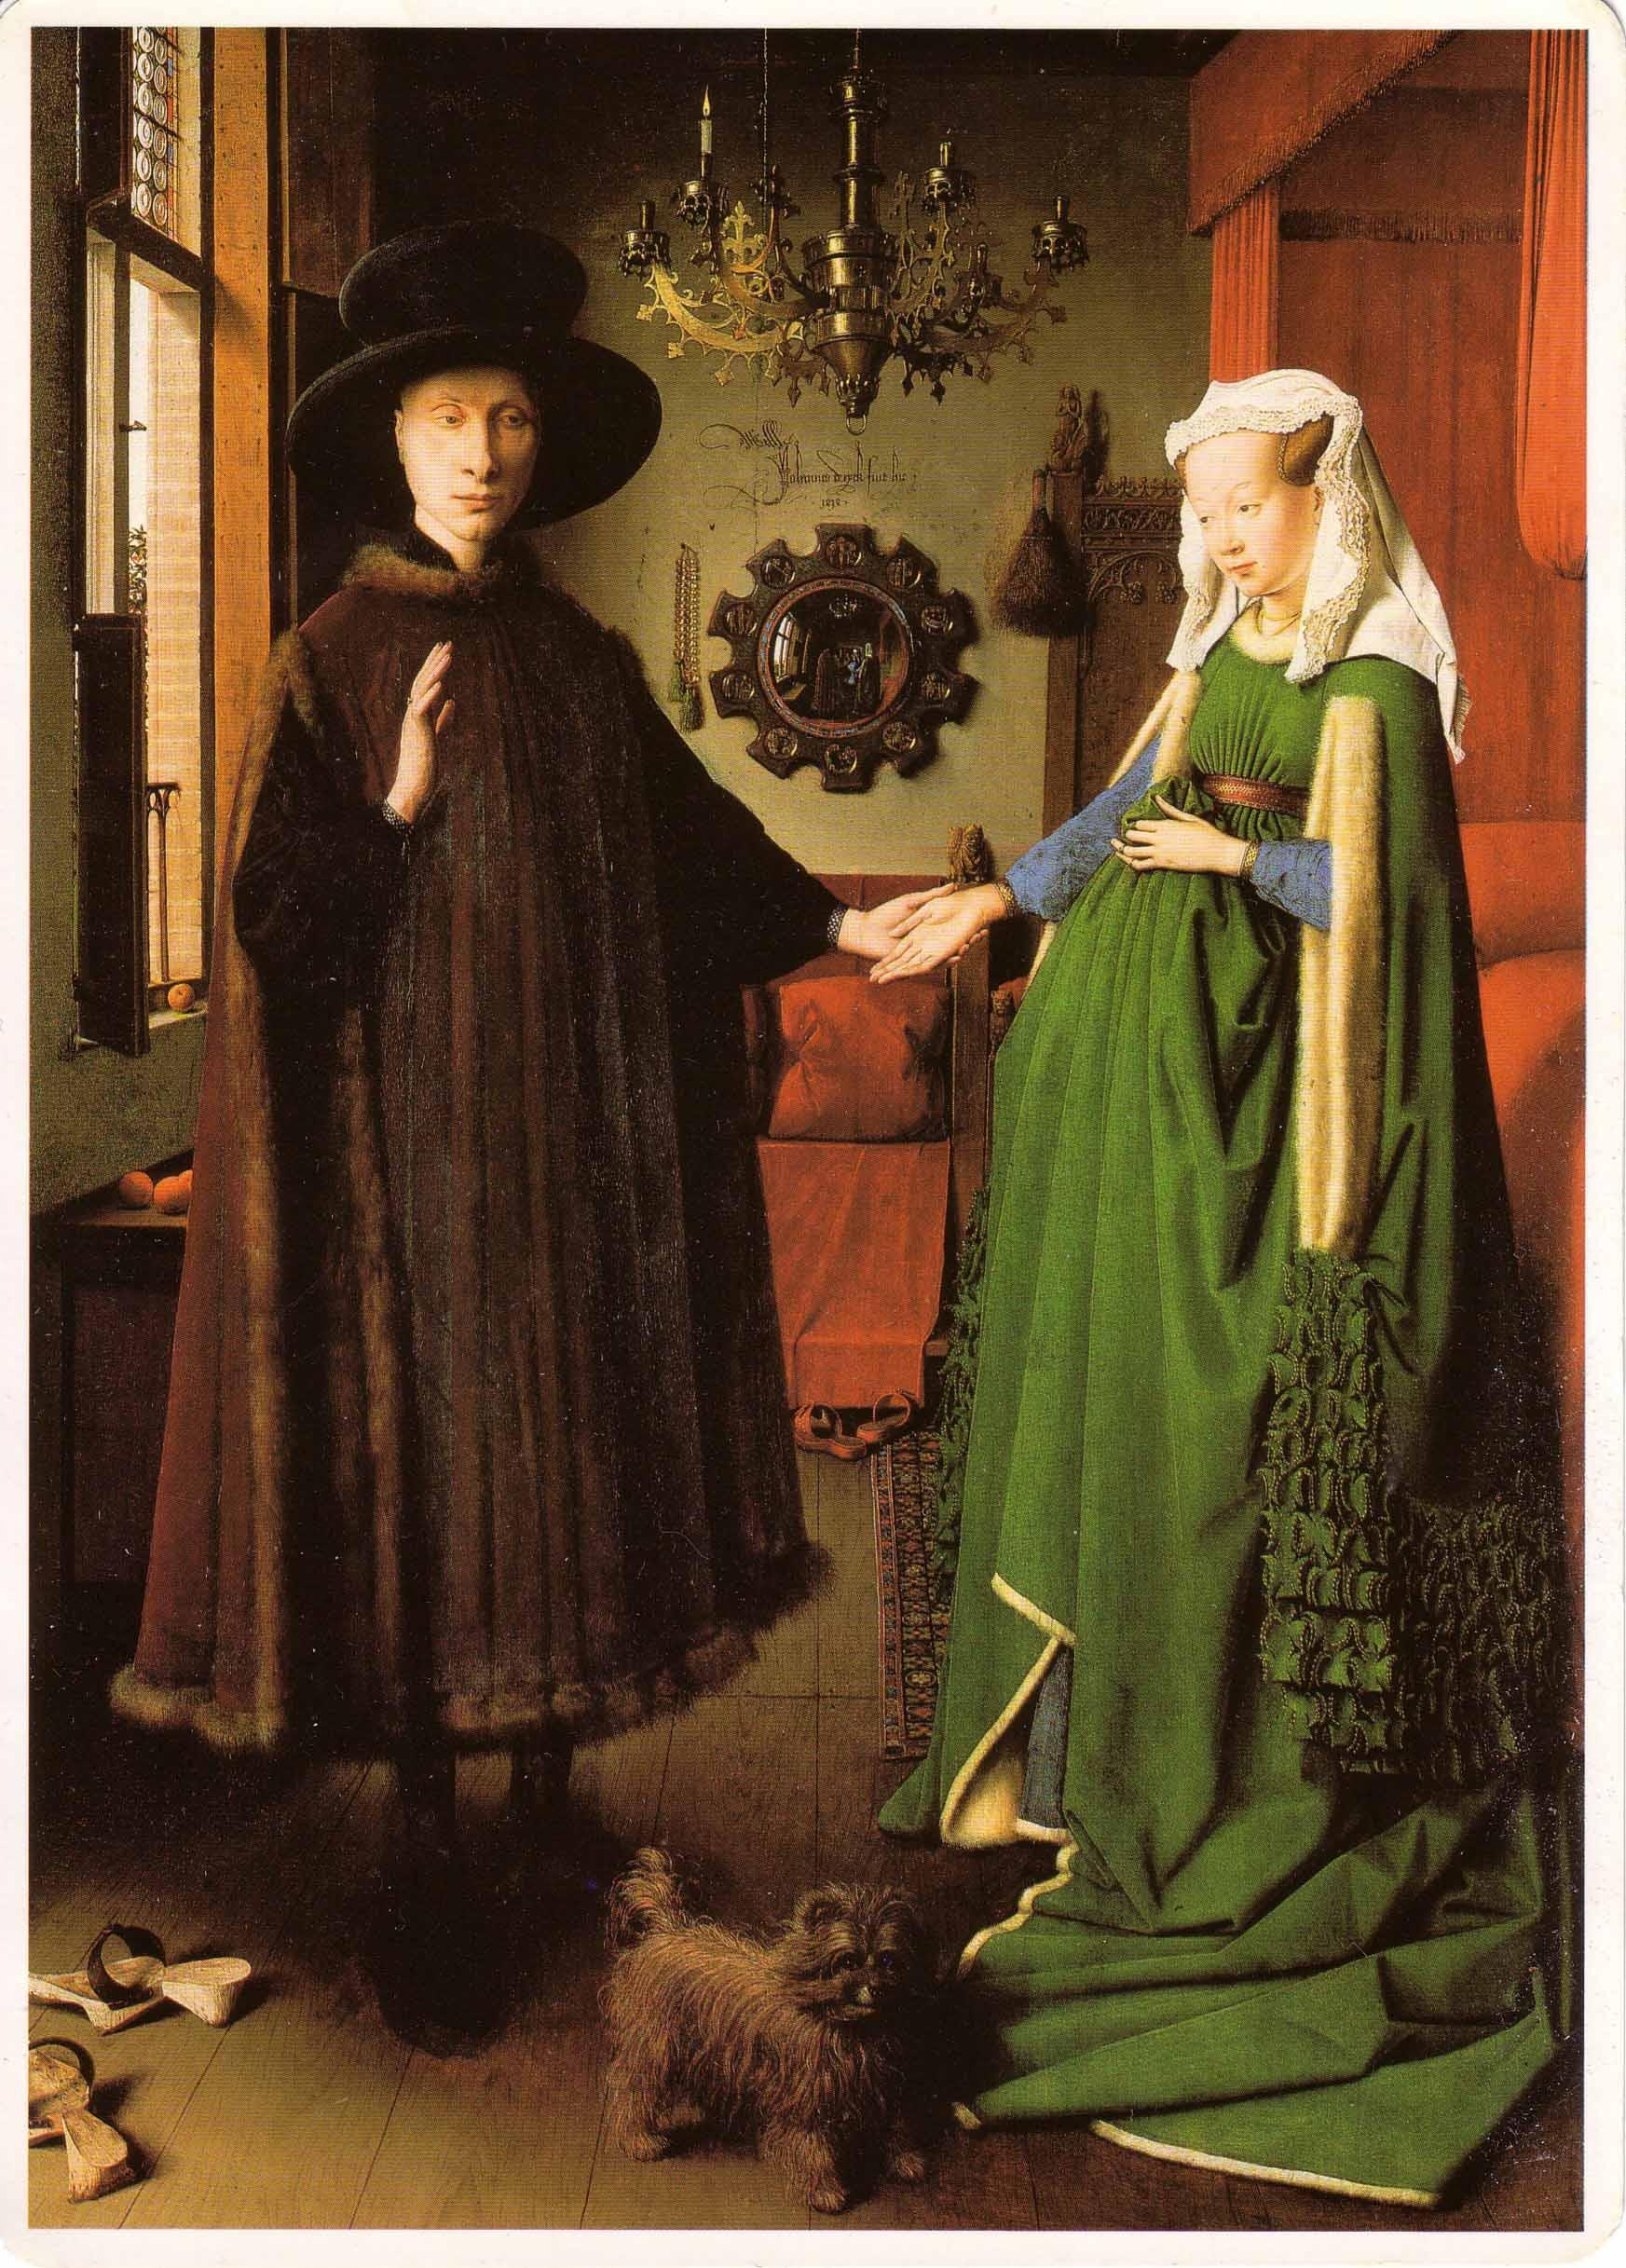 Jan van Eyck, Ritratto dei coniugi Arnolfini, 1434. National Gallery, Londra